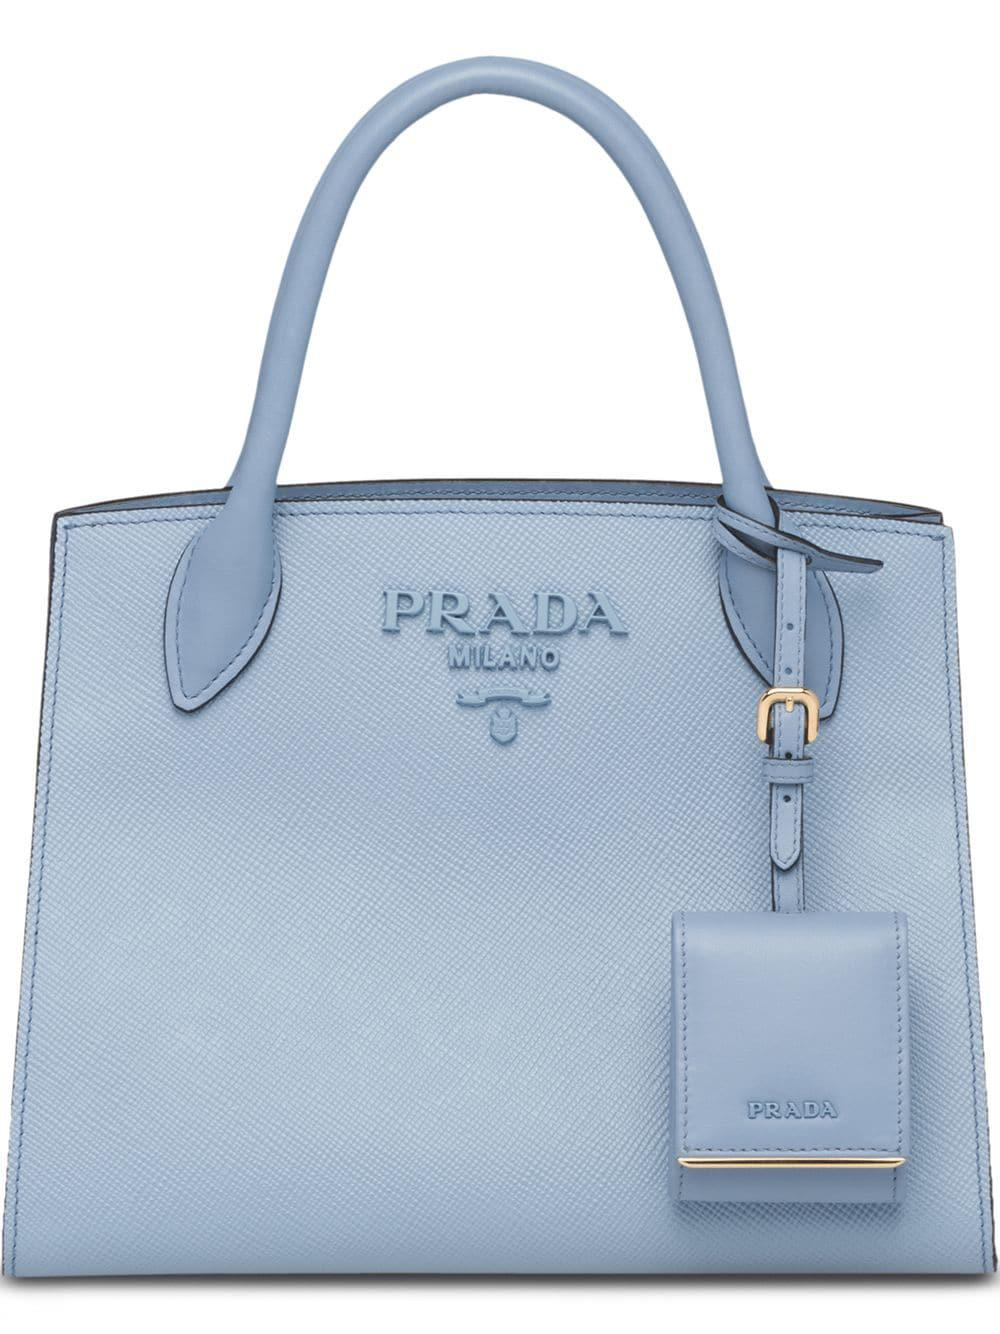 c82126596b5a4 Prada  Monochrome  Handtasche - Blau In Blue